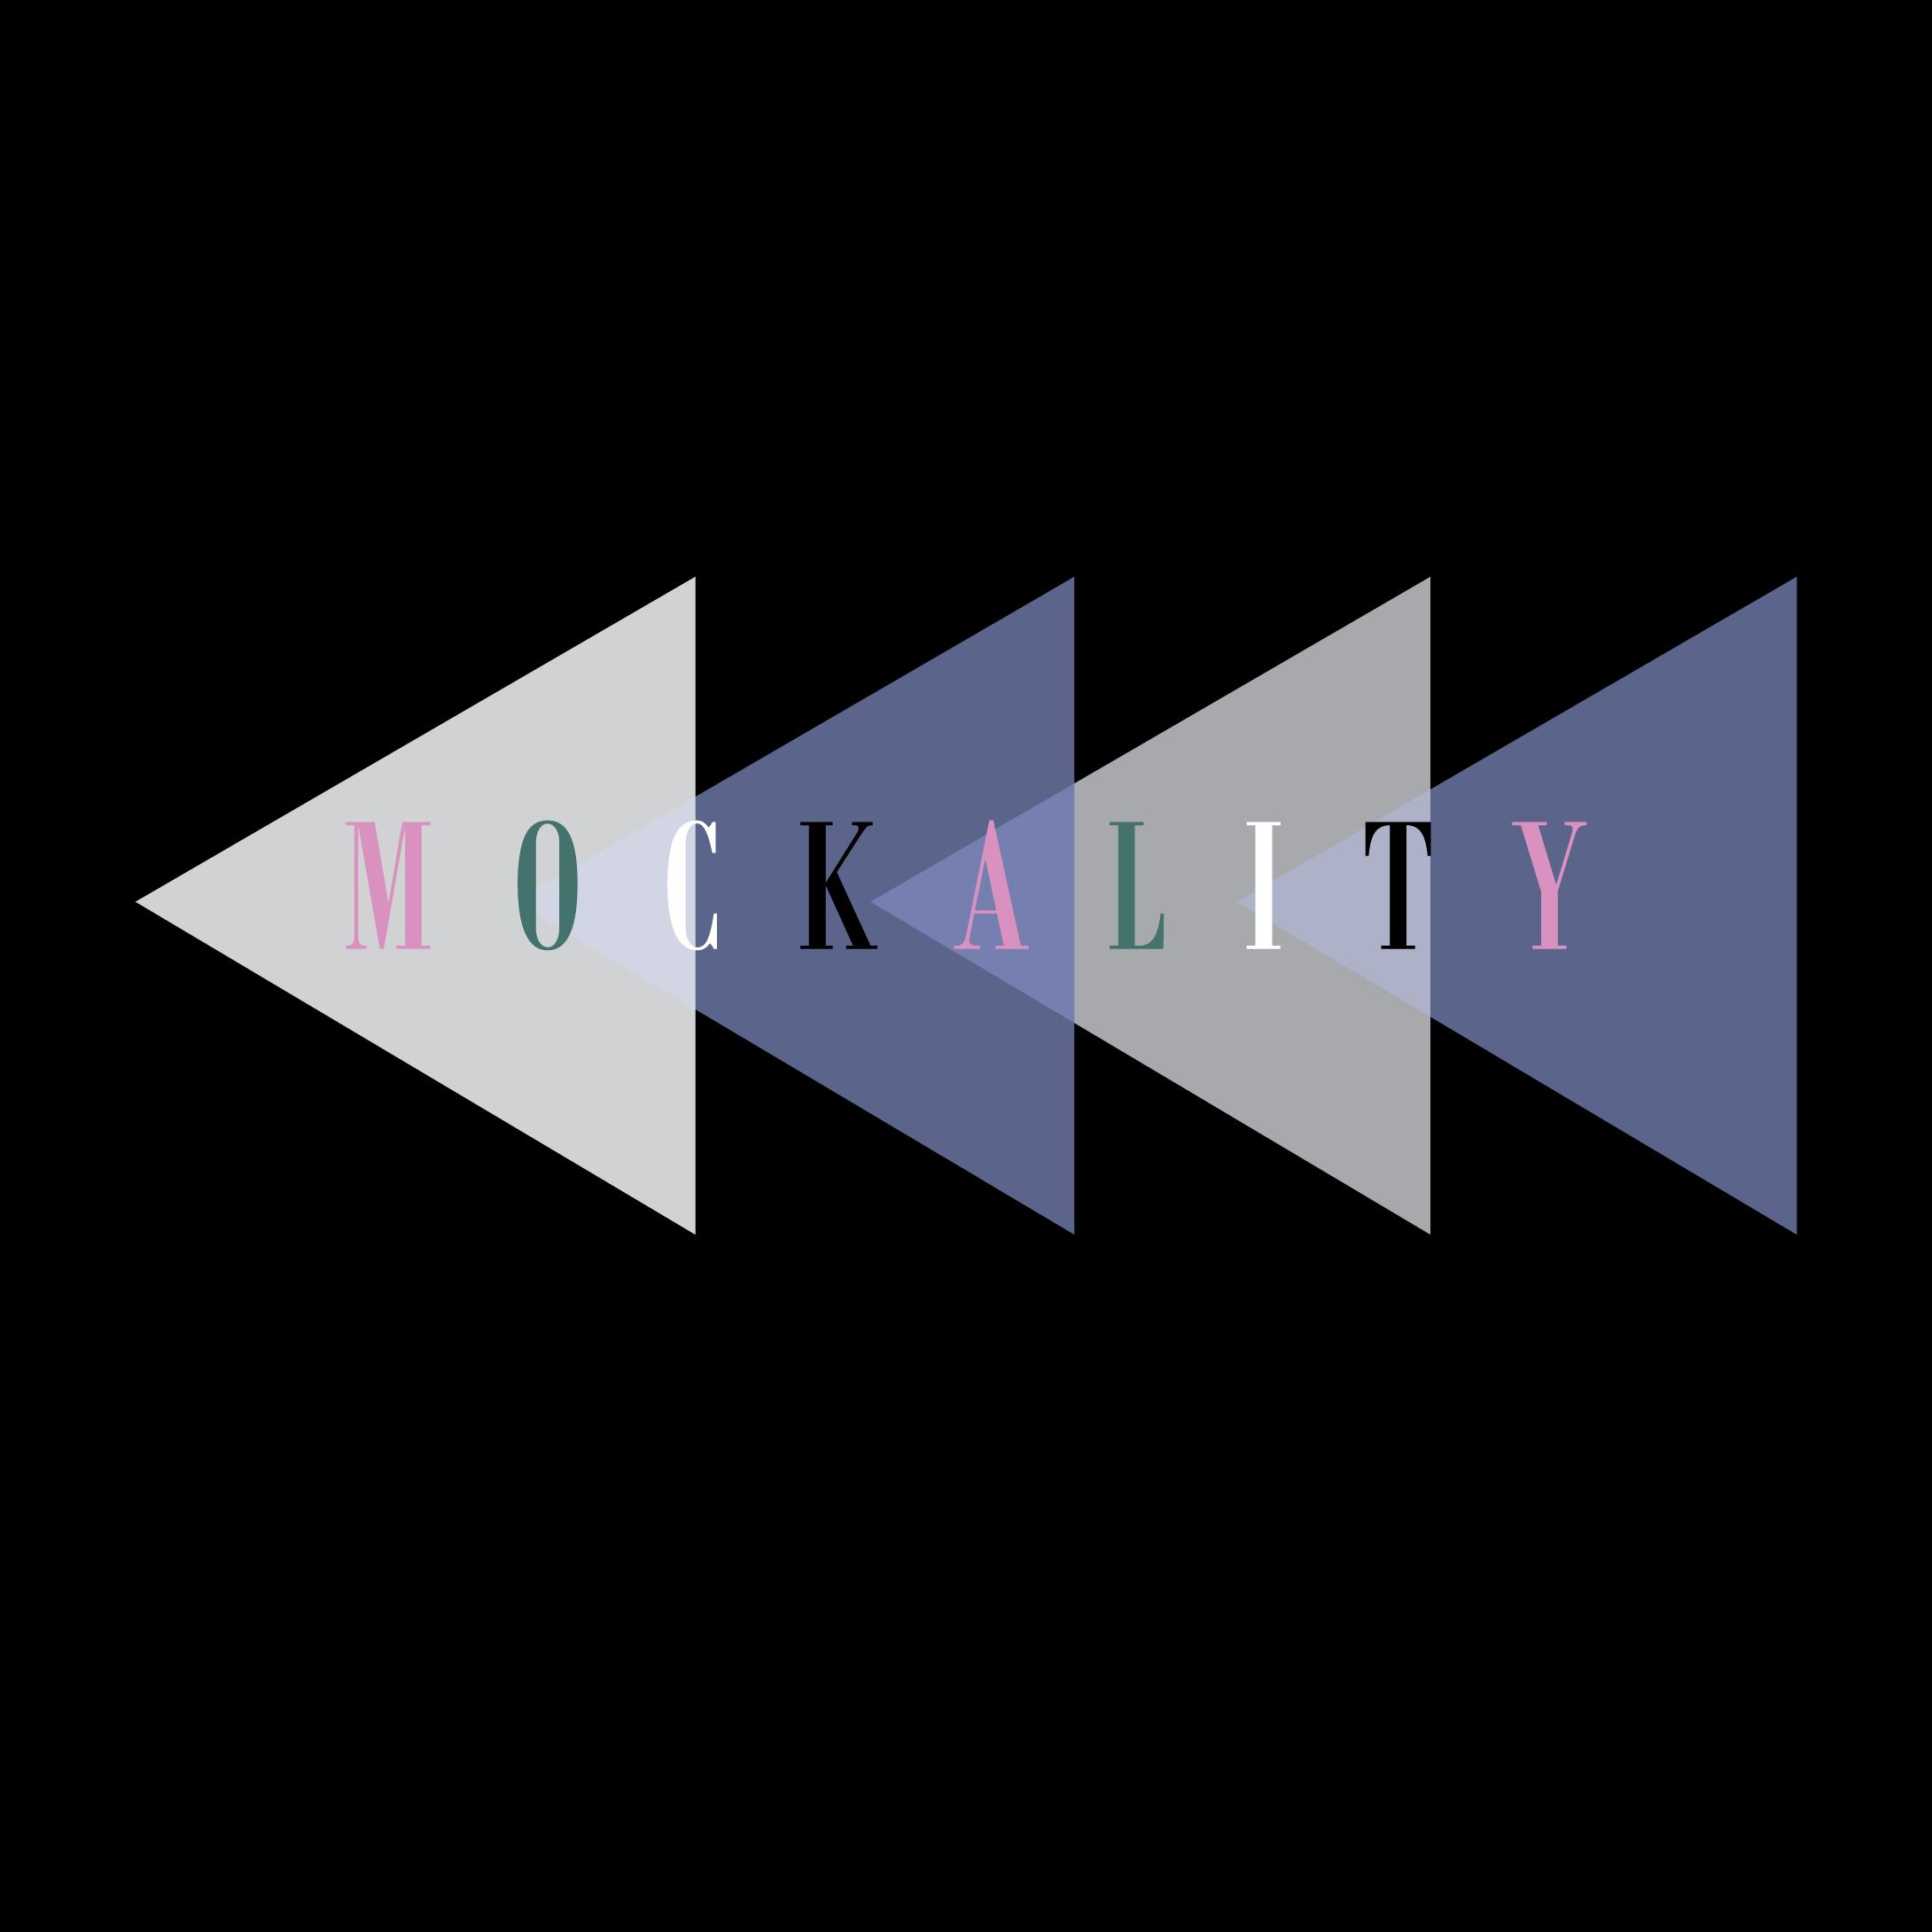 Mockality LogoFinal2.png